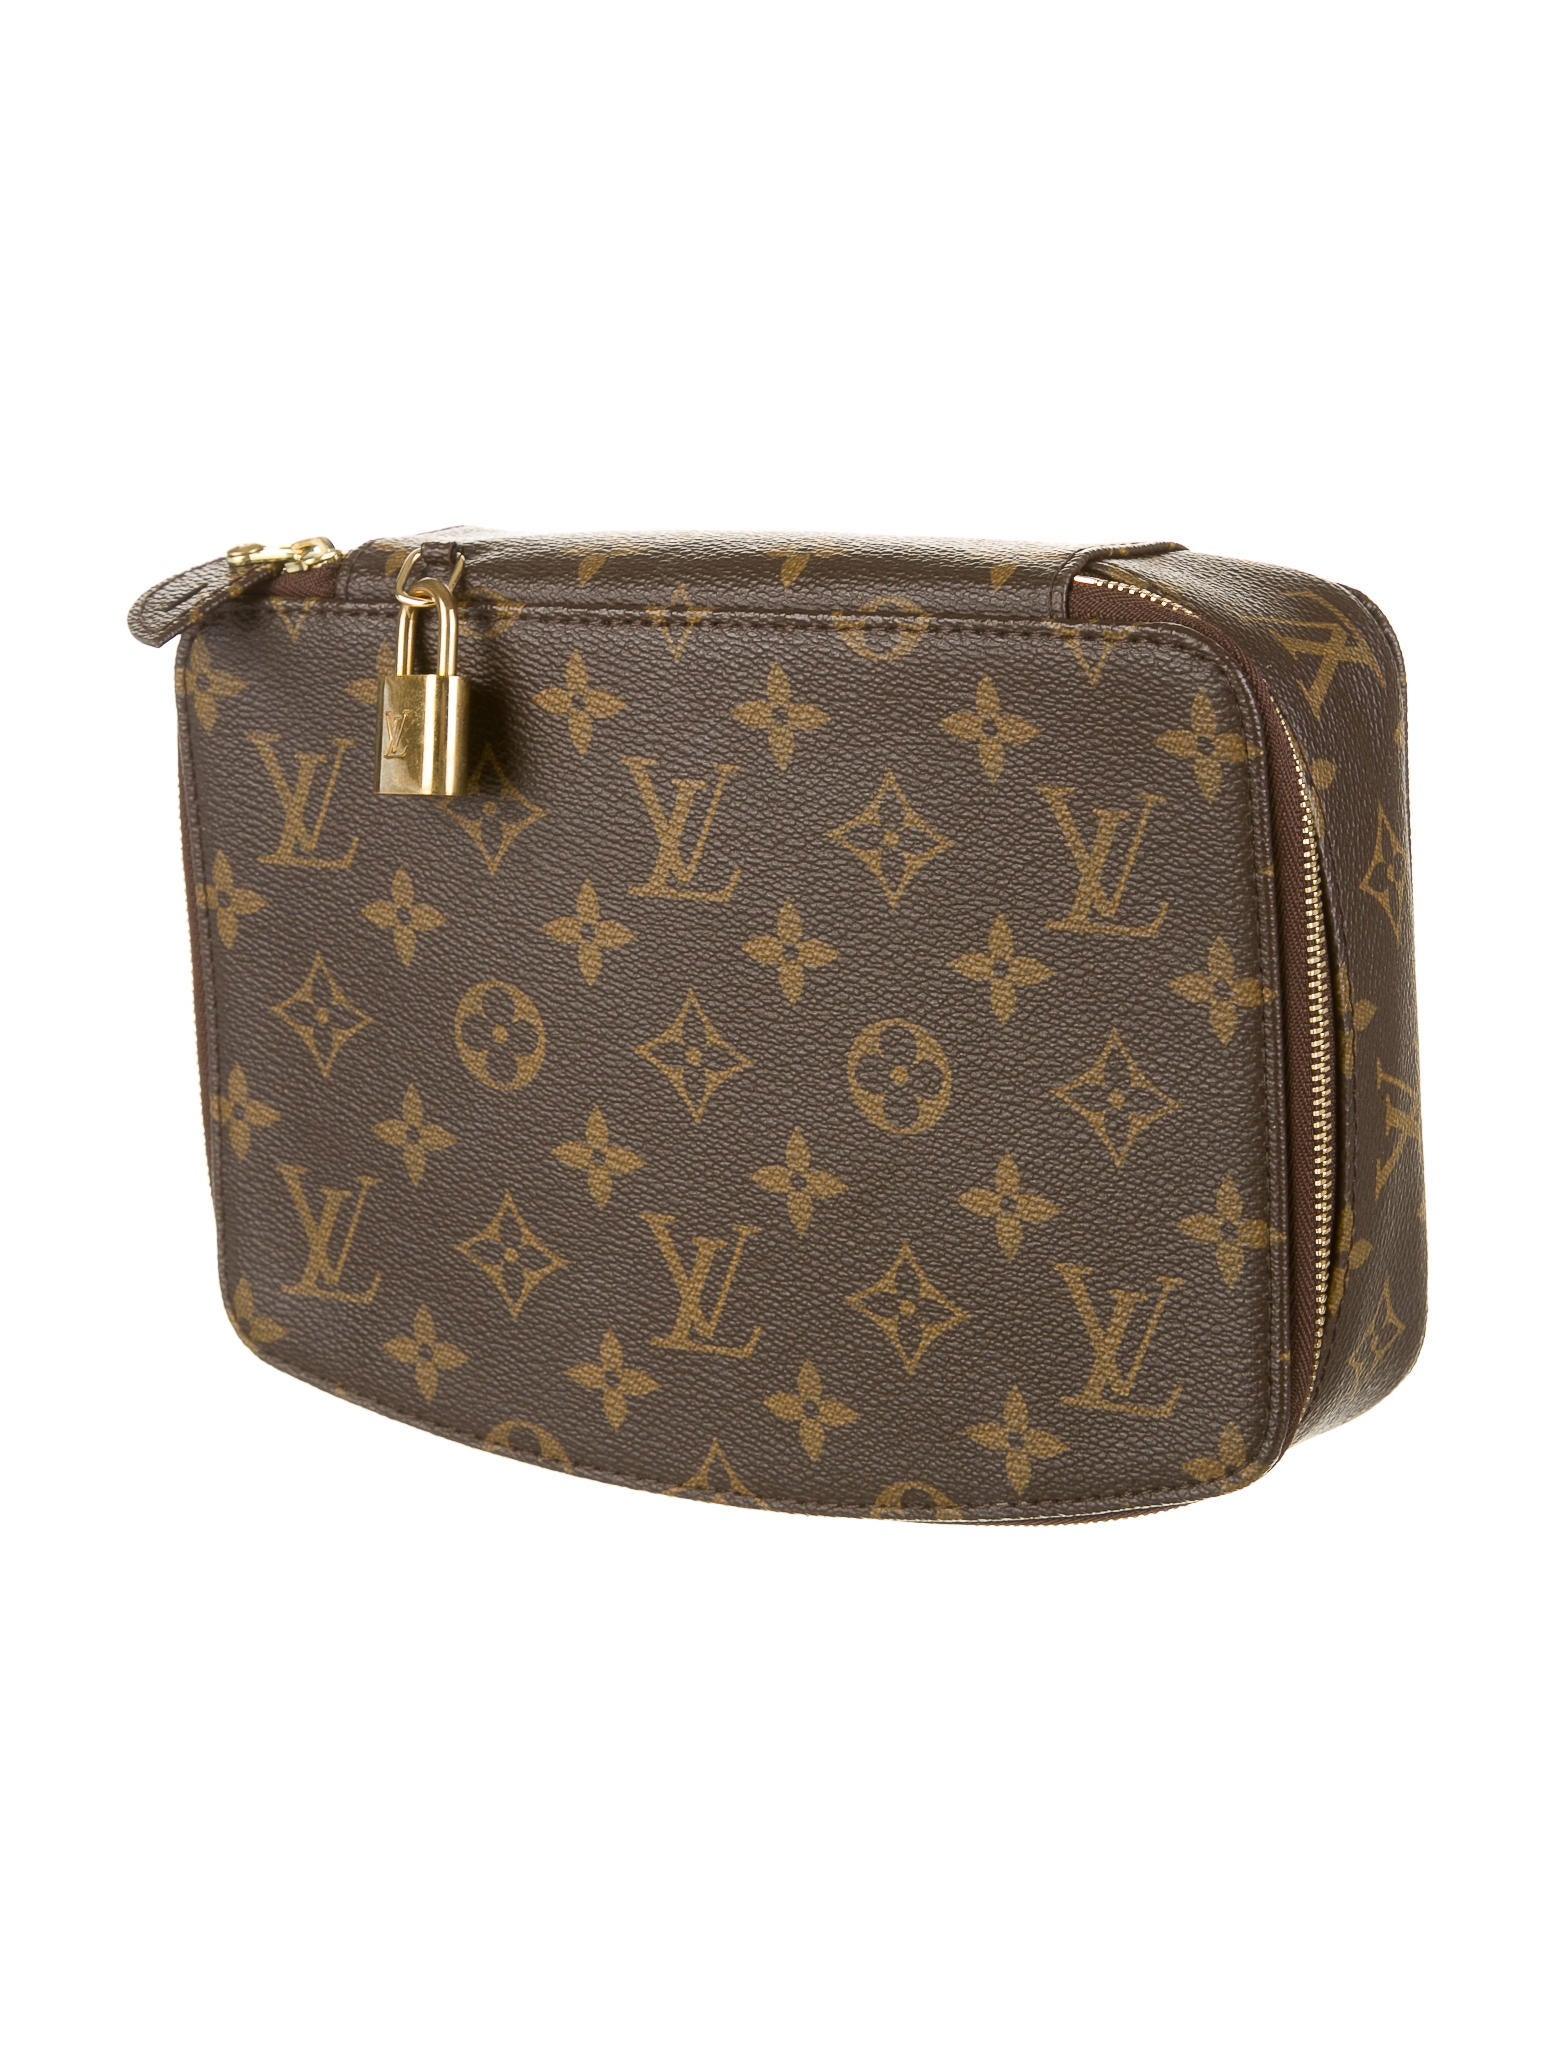 Louis Vuitton Monte Carlo Jewelry Box Accessories LOU35809 The